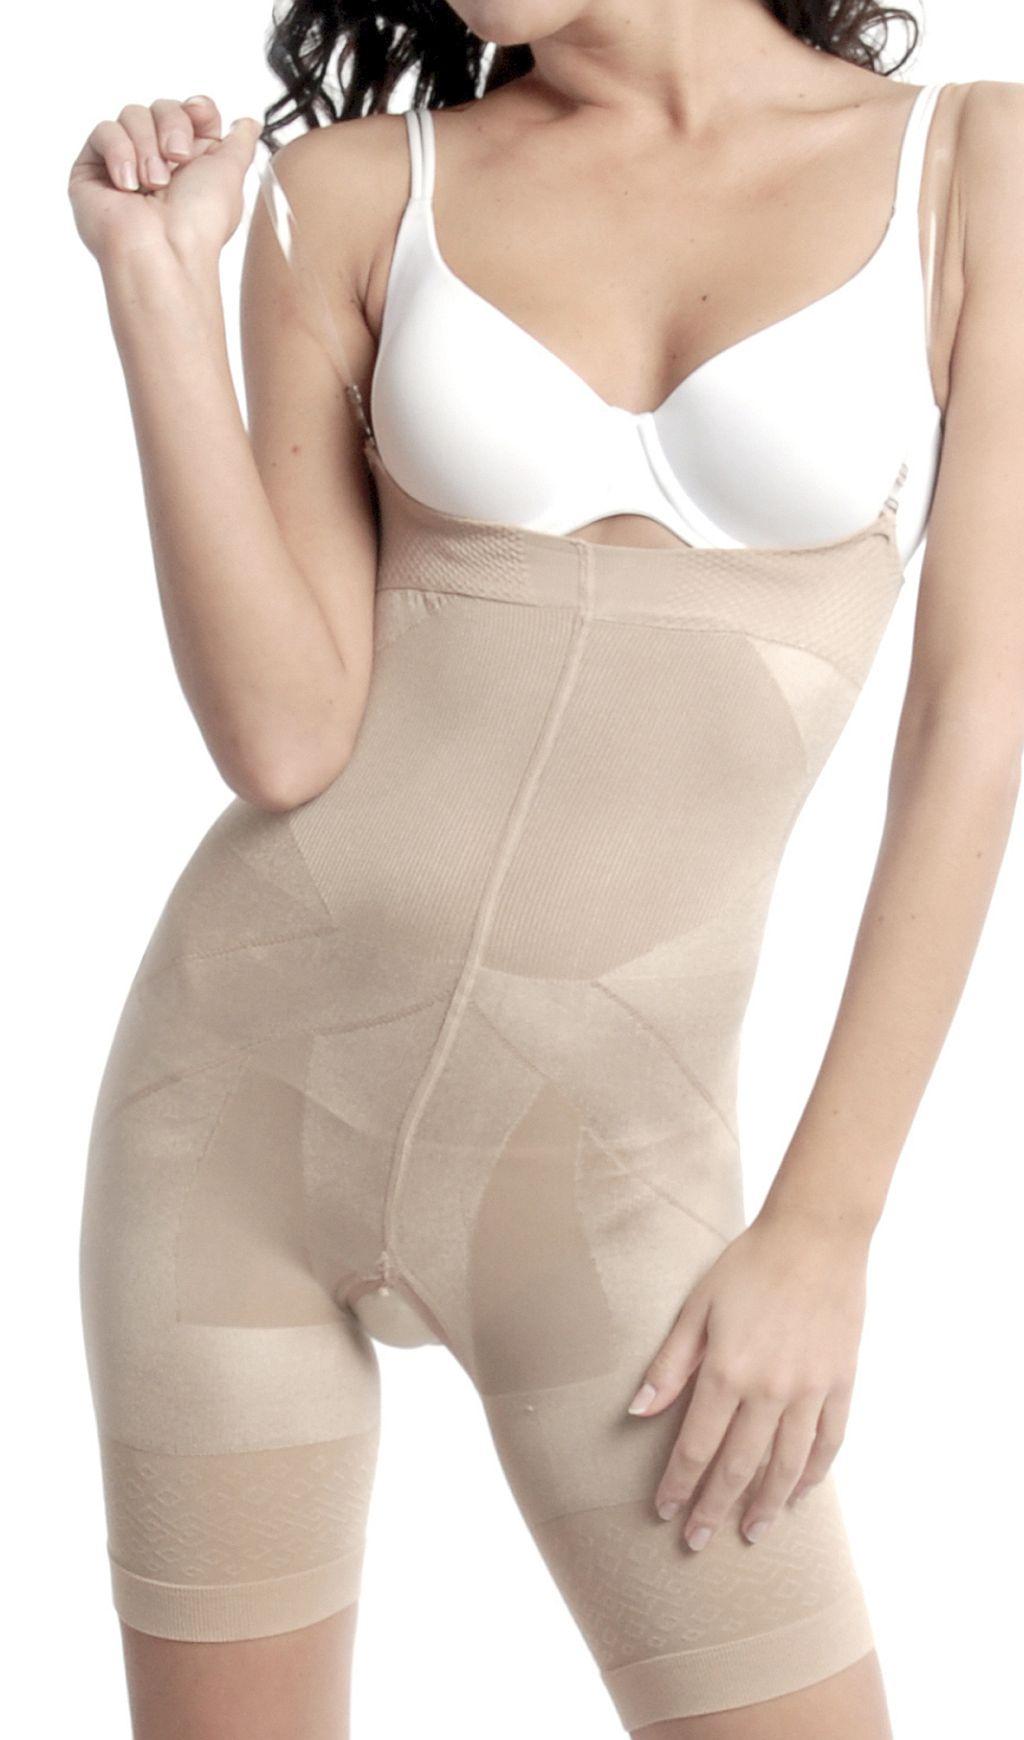 OriRose Damen Slim Comfort Miederhose Panty offener Schritt haut S-XXXL